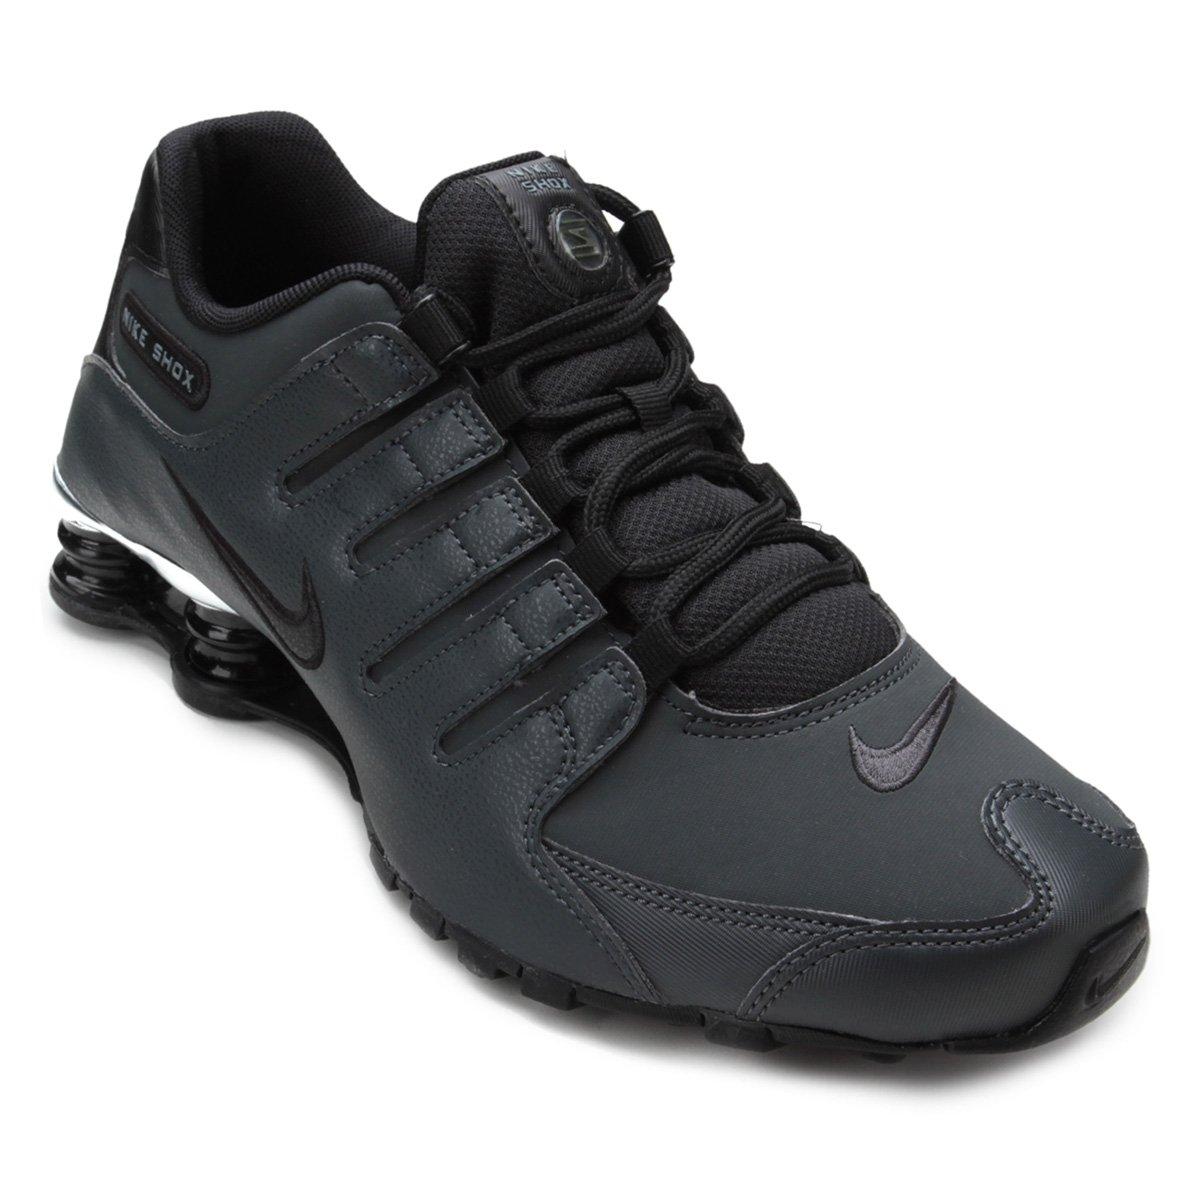 2d929a1f8f6 Tênis Masculino Nike Shox NZ PRM 536184-003 - Chumbo Preto ...